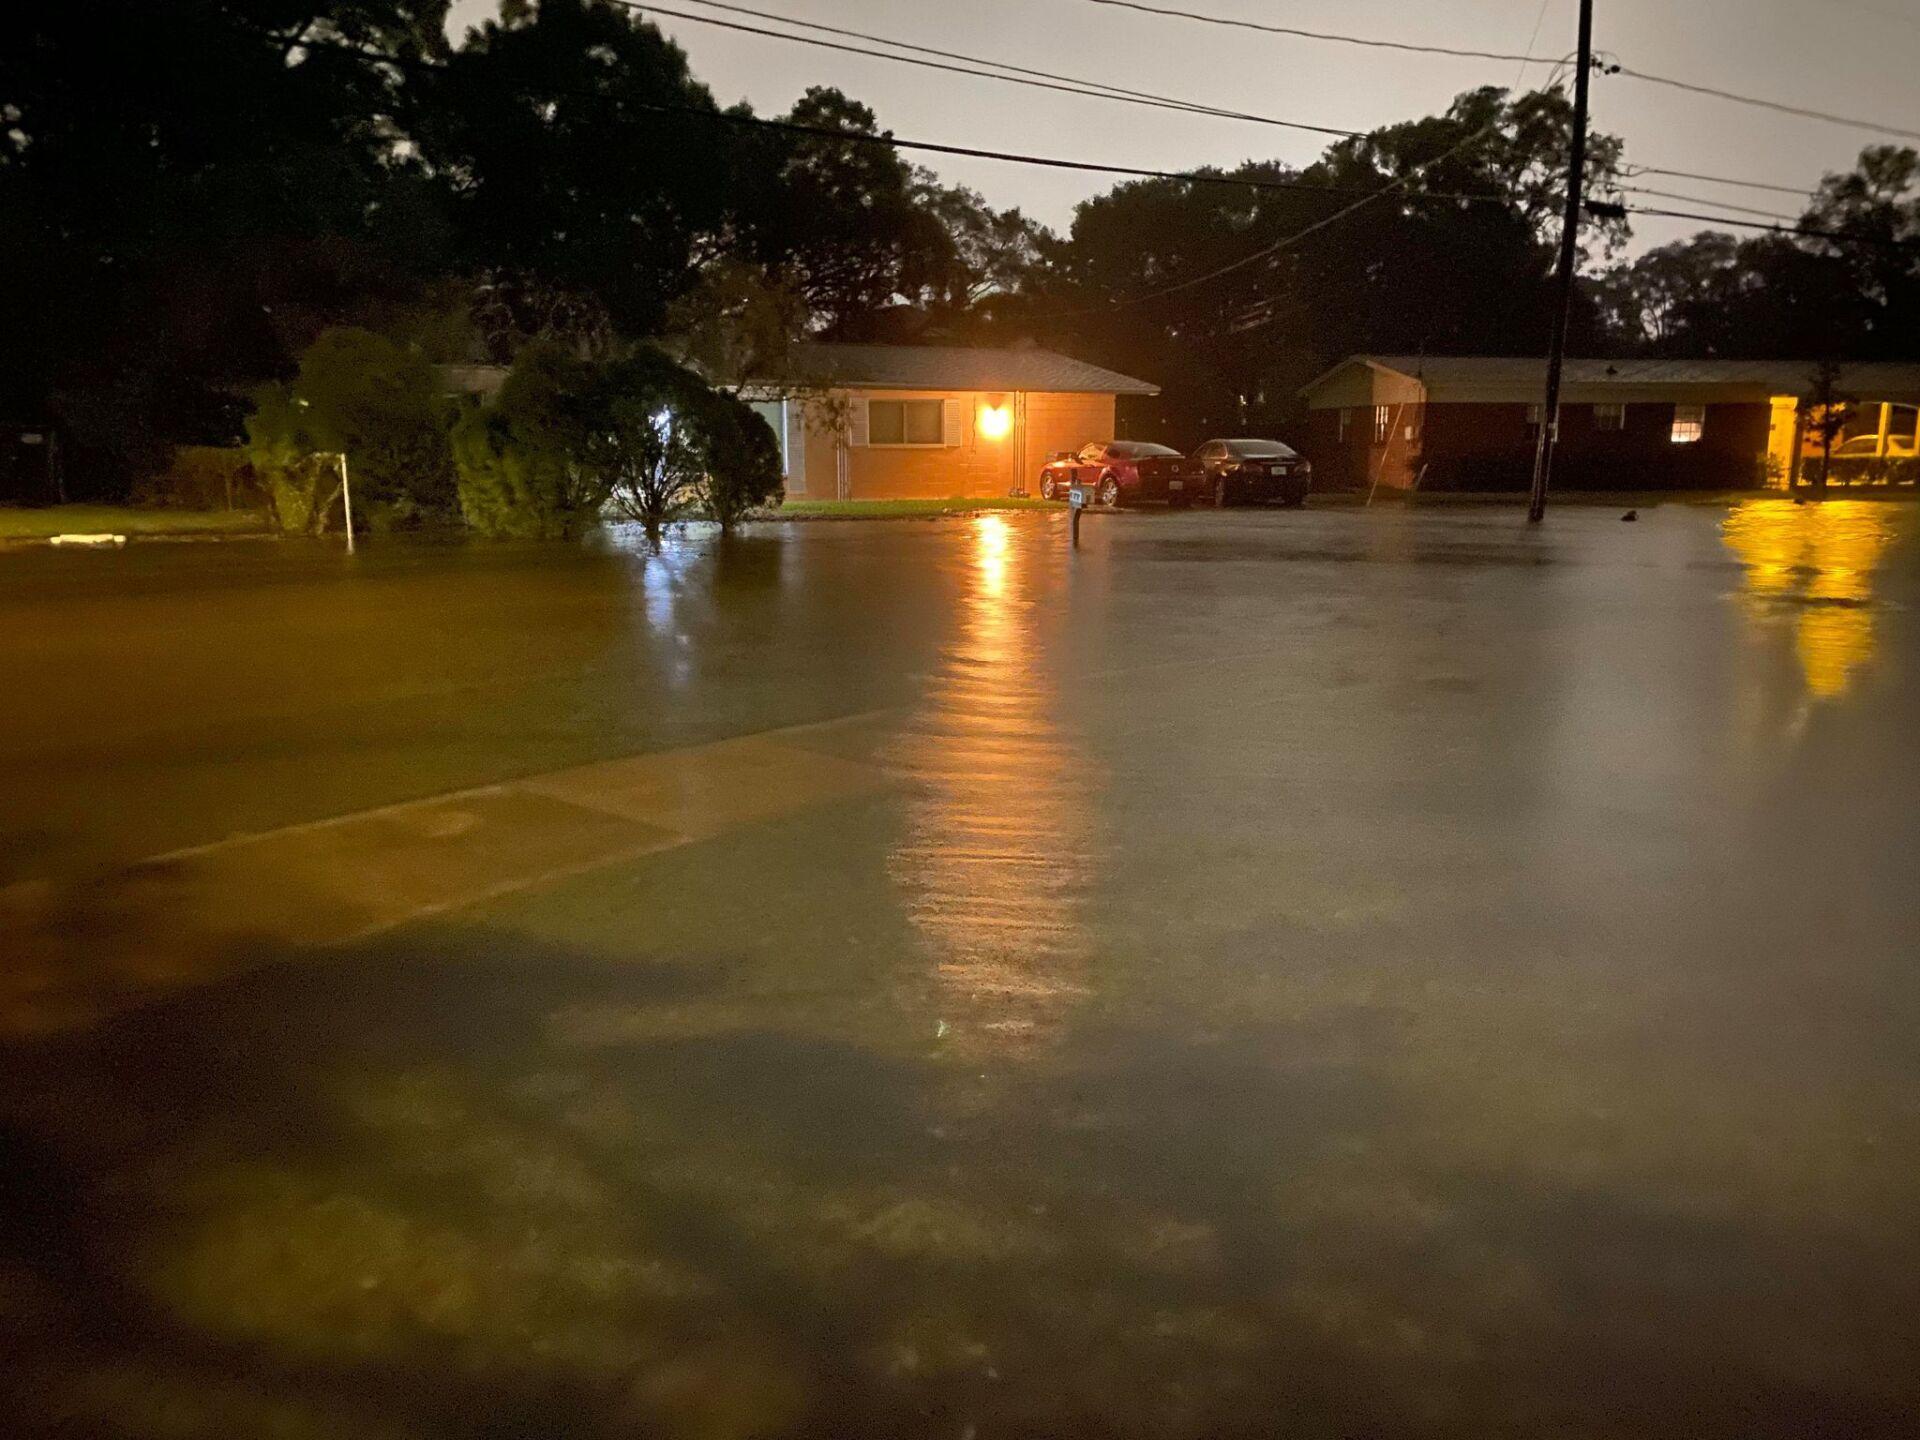 Oldsmar_Mobbly Bayou Flooding_Holli Purcell 1.jpg